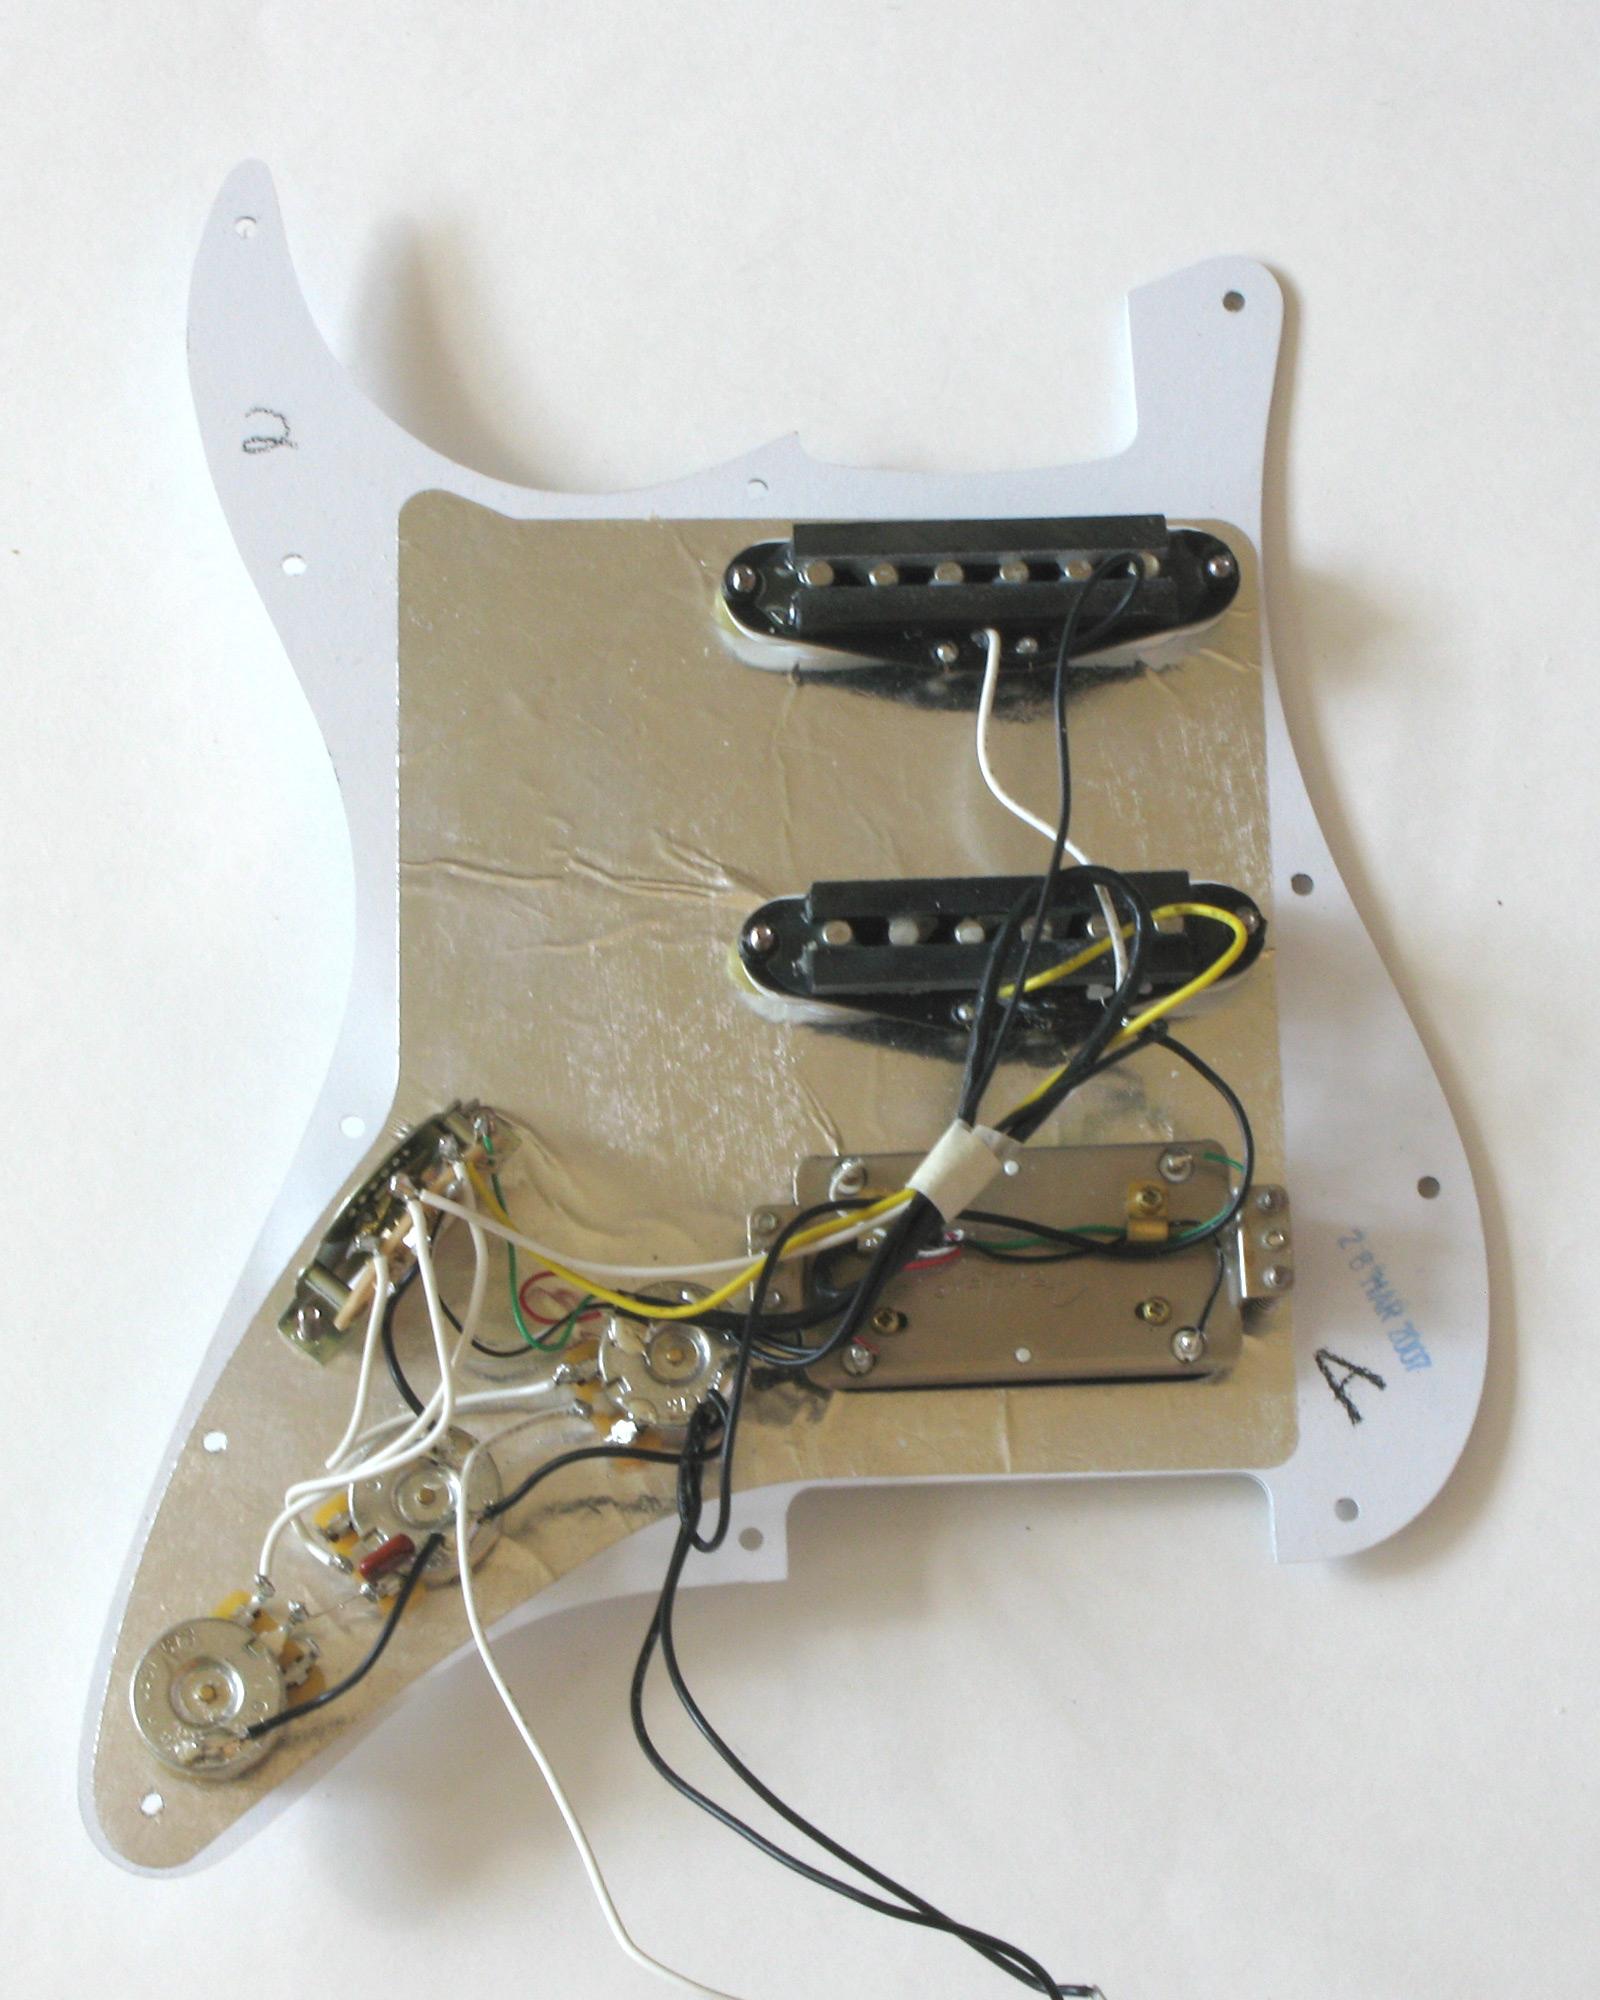 Fender Stratocaster Mexican Hss Pickguard Wiring Diagram - Fender Stratocaster Wiring Diagram